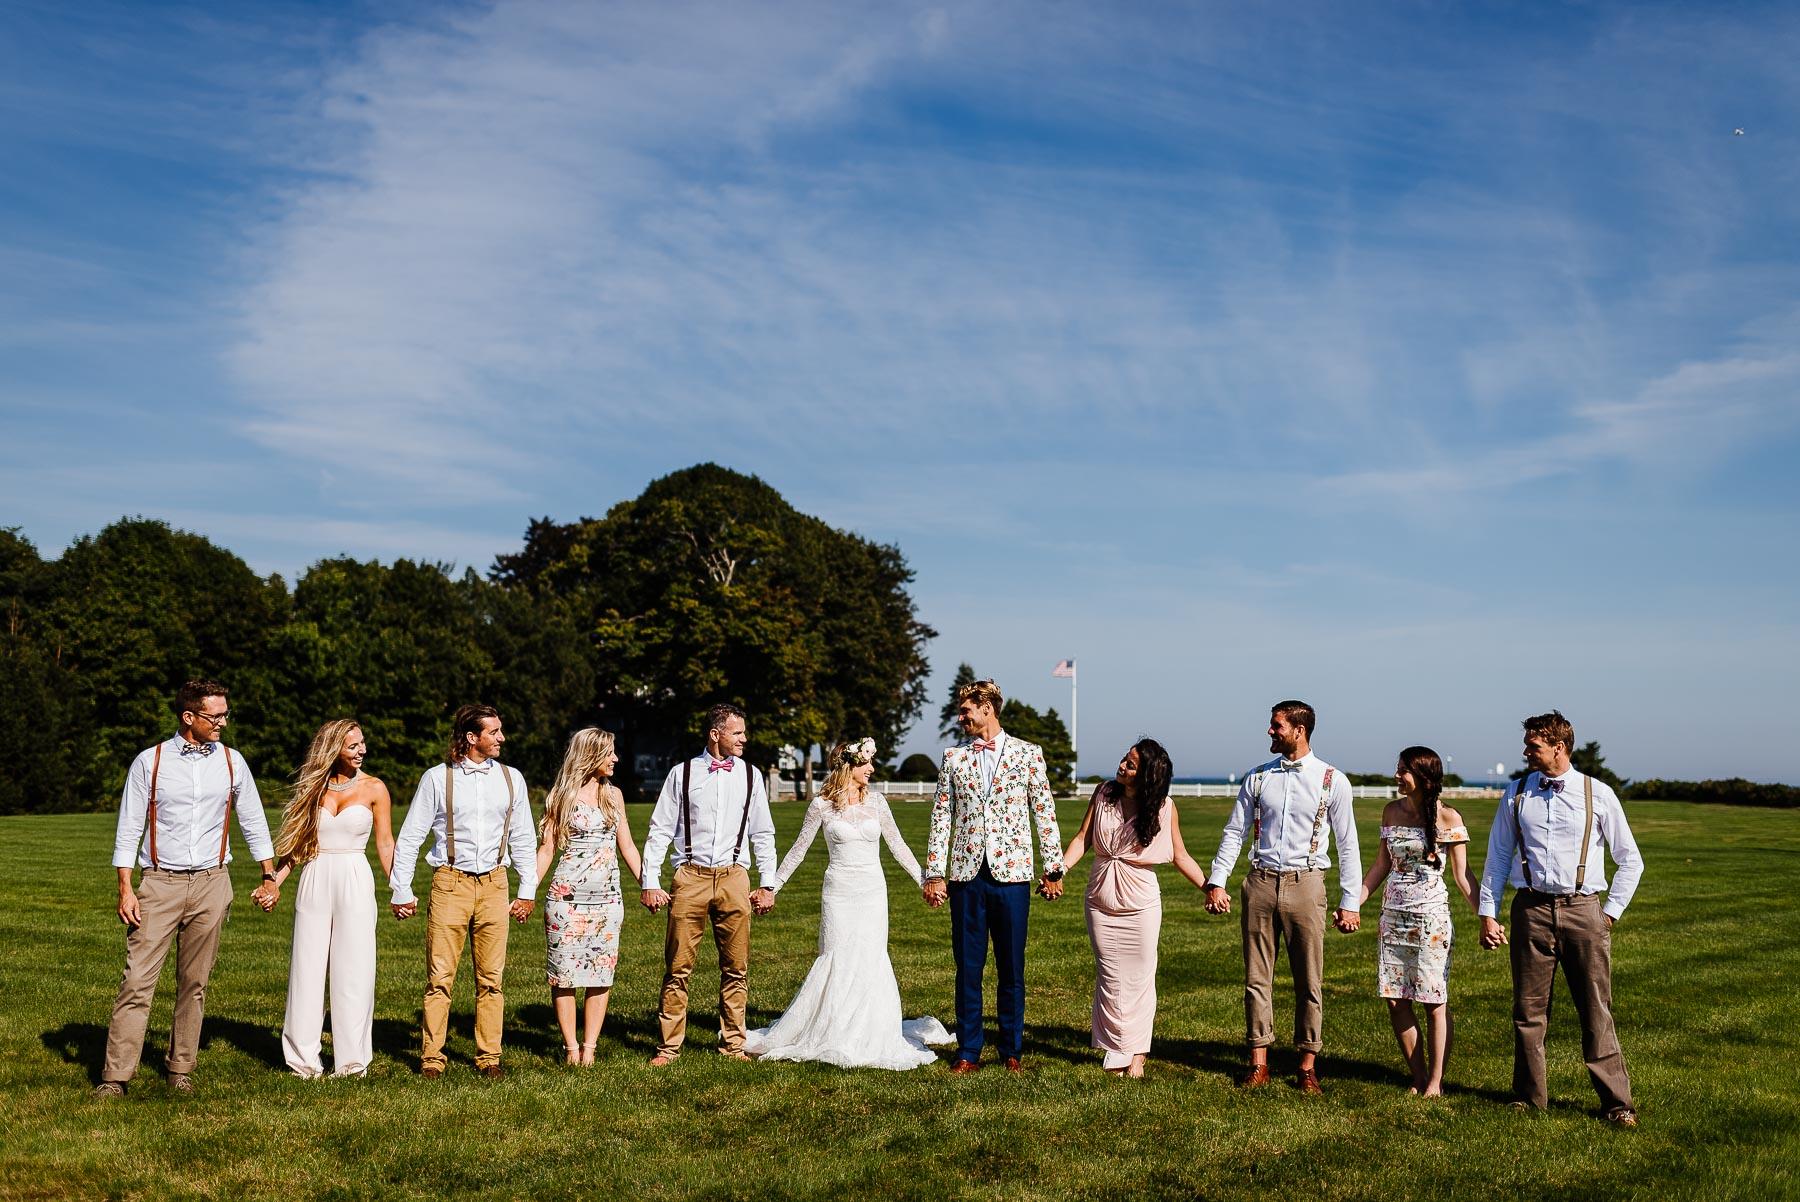 79-Bohemian New Hampshire Beach Wedding Rye New Hampshire Weddings Summer Sessions Surf Shop Longbrook Photography.jpg